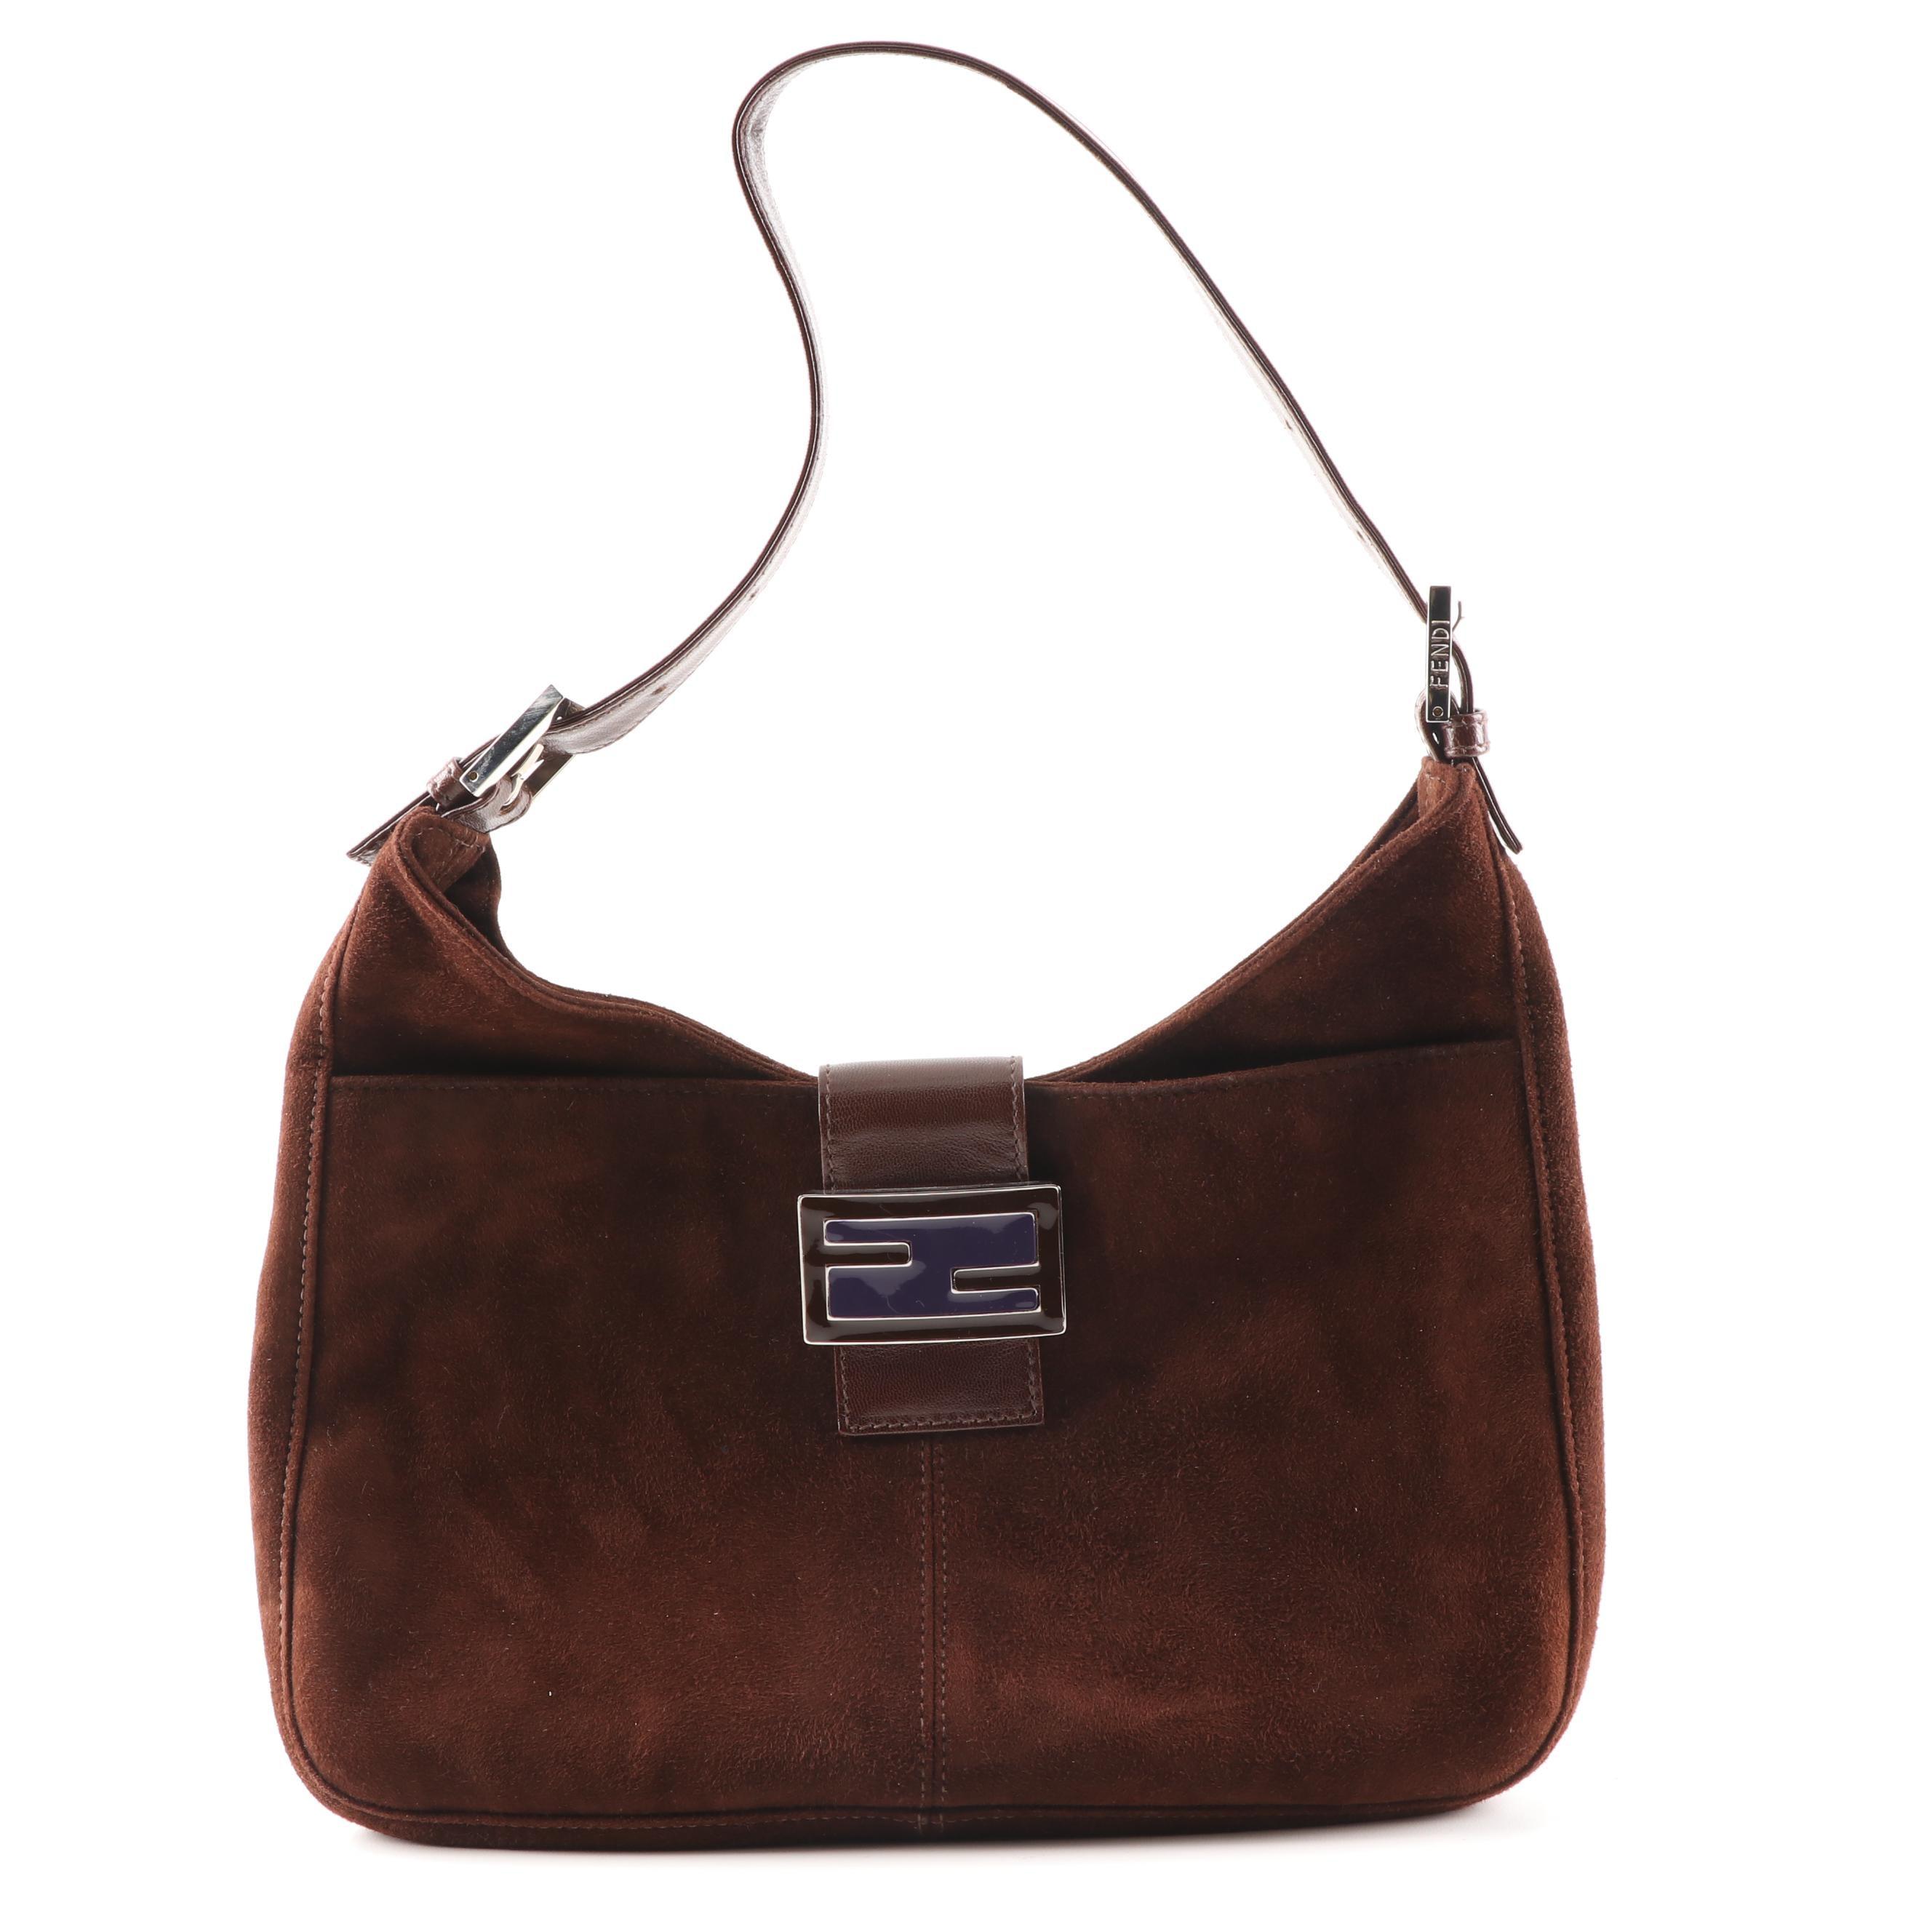 Fendi Cognac Brown Suede and Leather Handbag